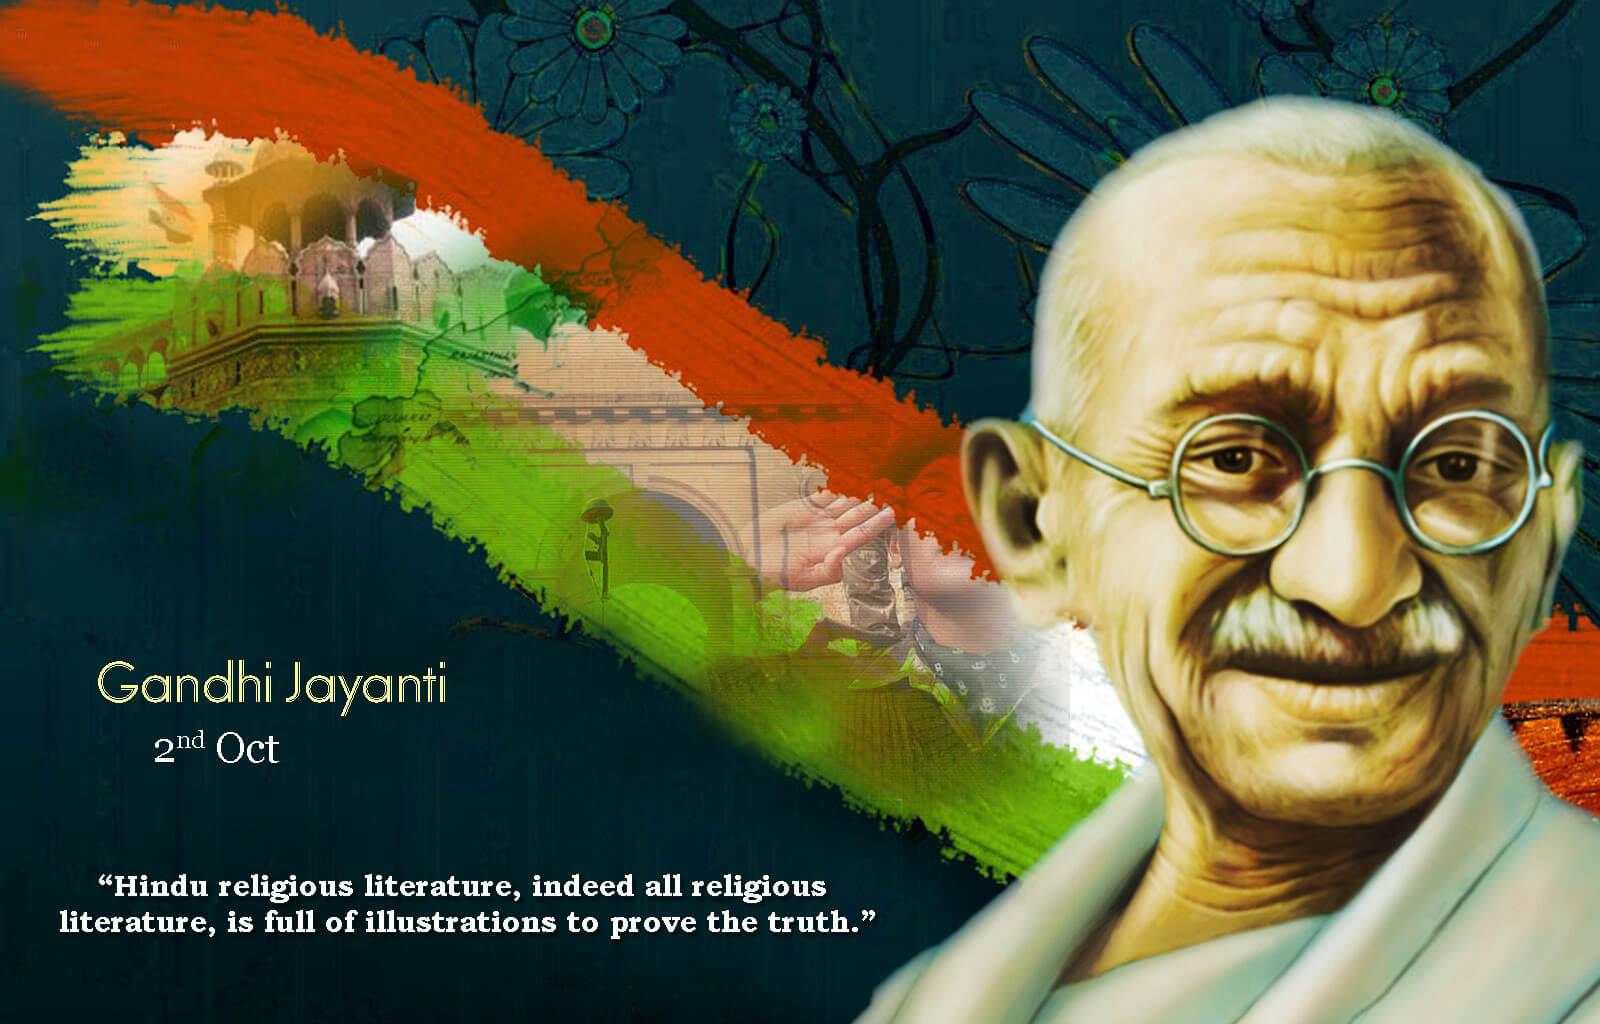 happy gandhi jayanti art new hd wallpaper